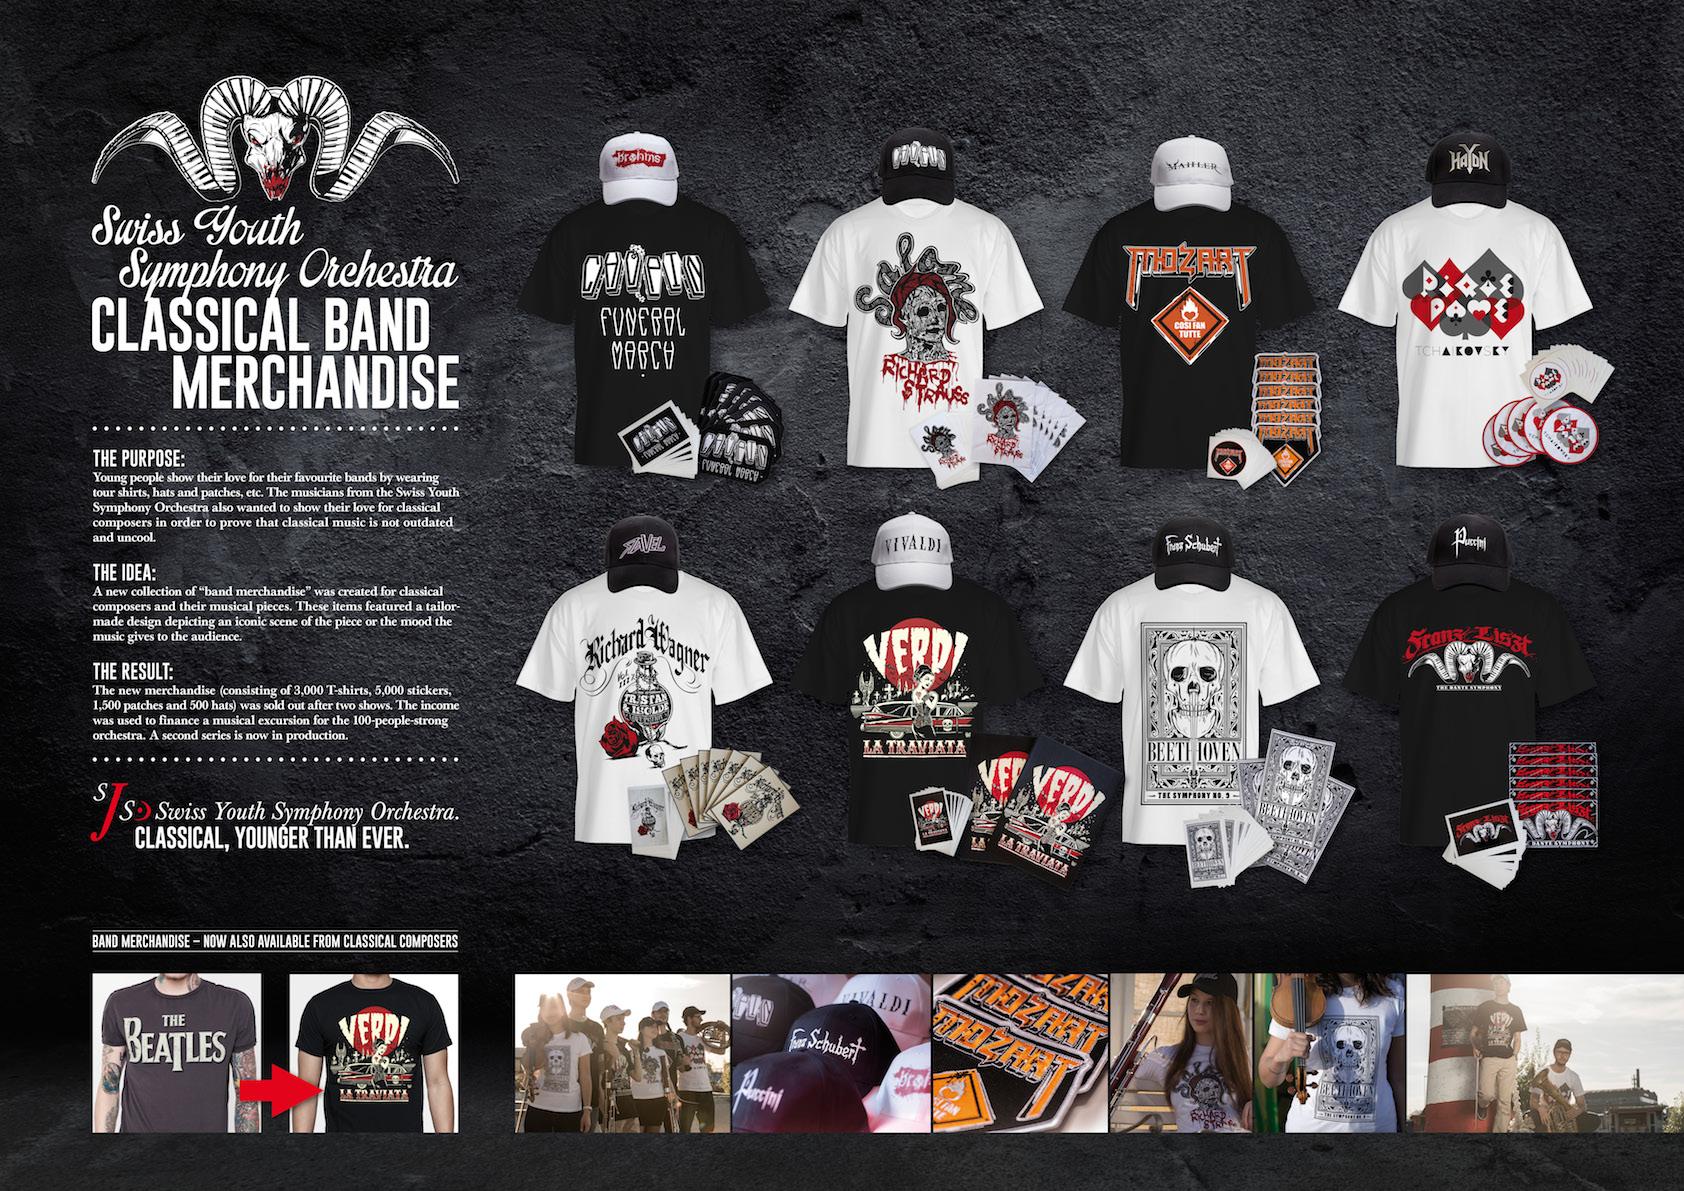 classical-band-merchandise.jpg